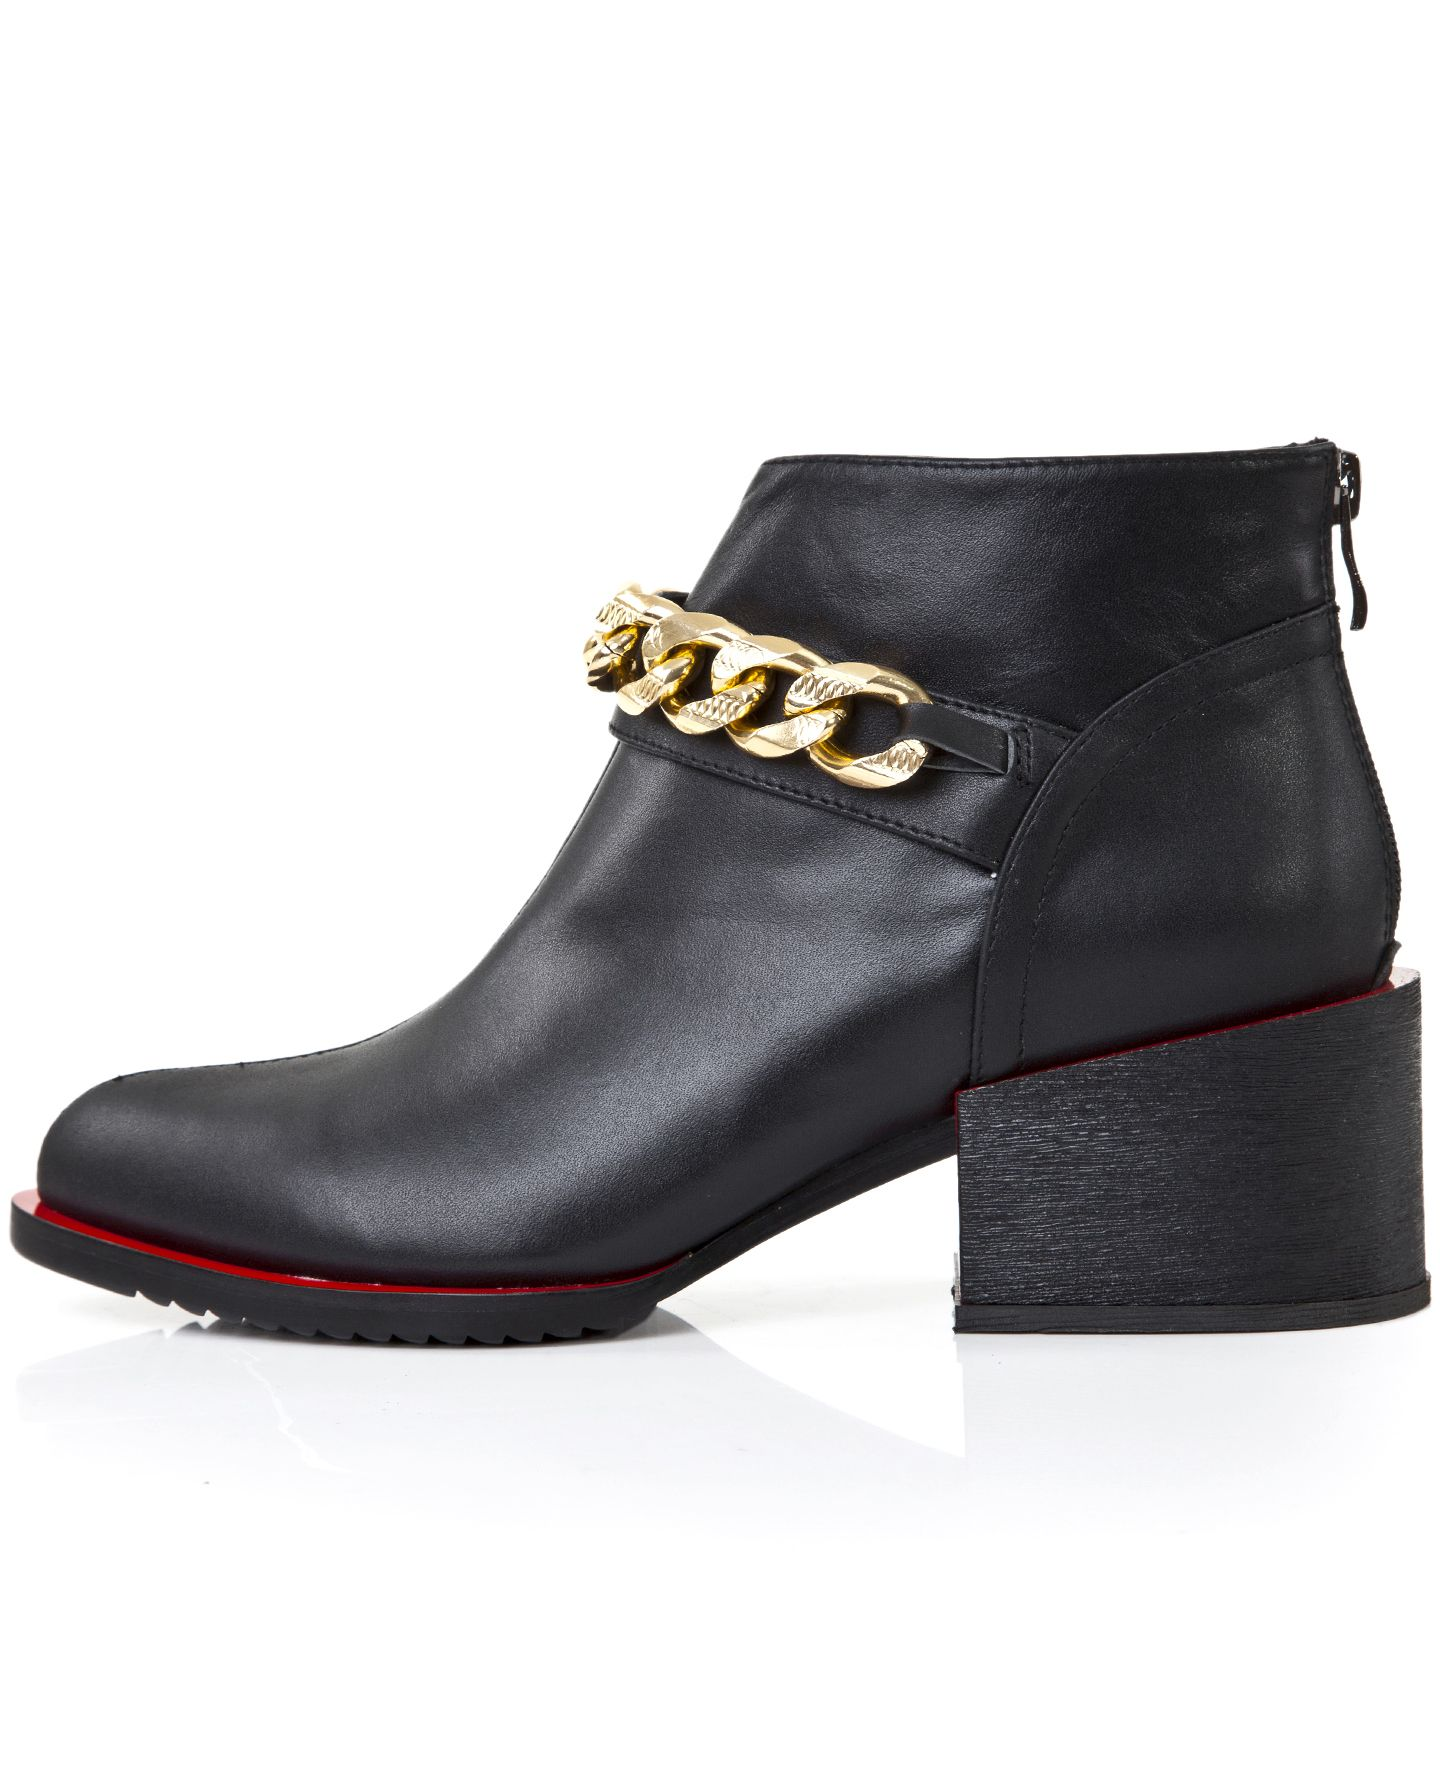 Saturday fashion picks: http://www.goldandsilversparkles.com/2015/01/saturday-fashion-picks.html